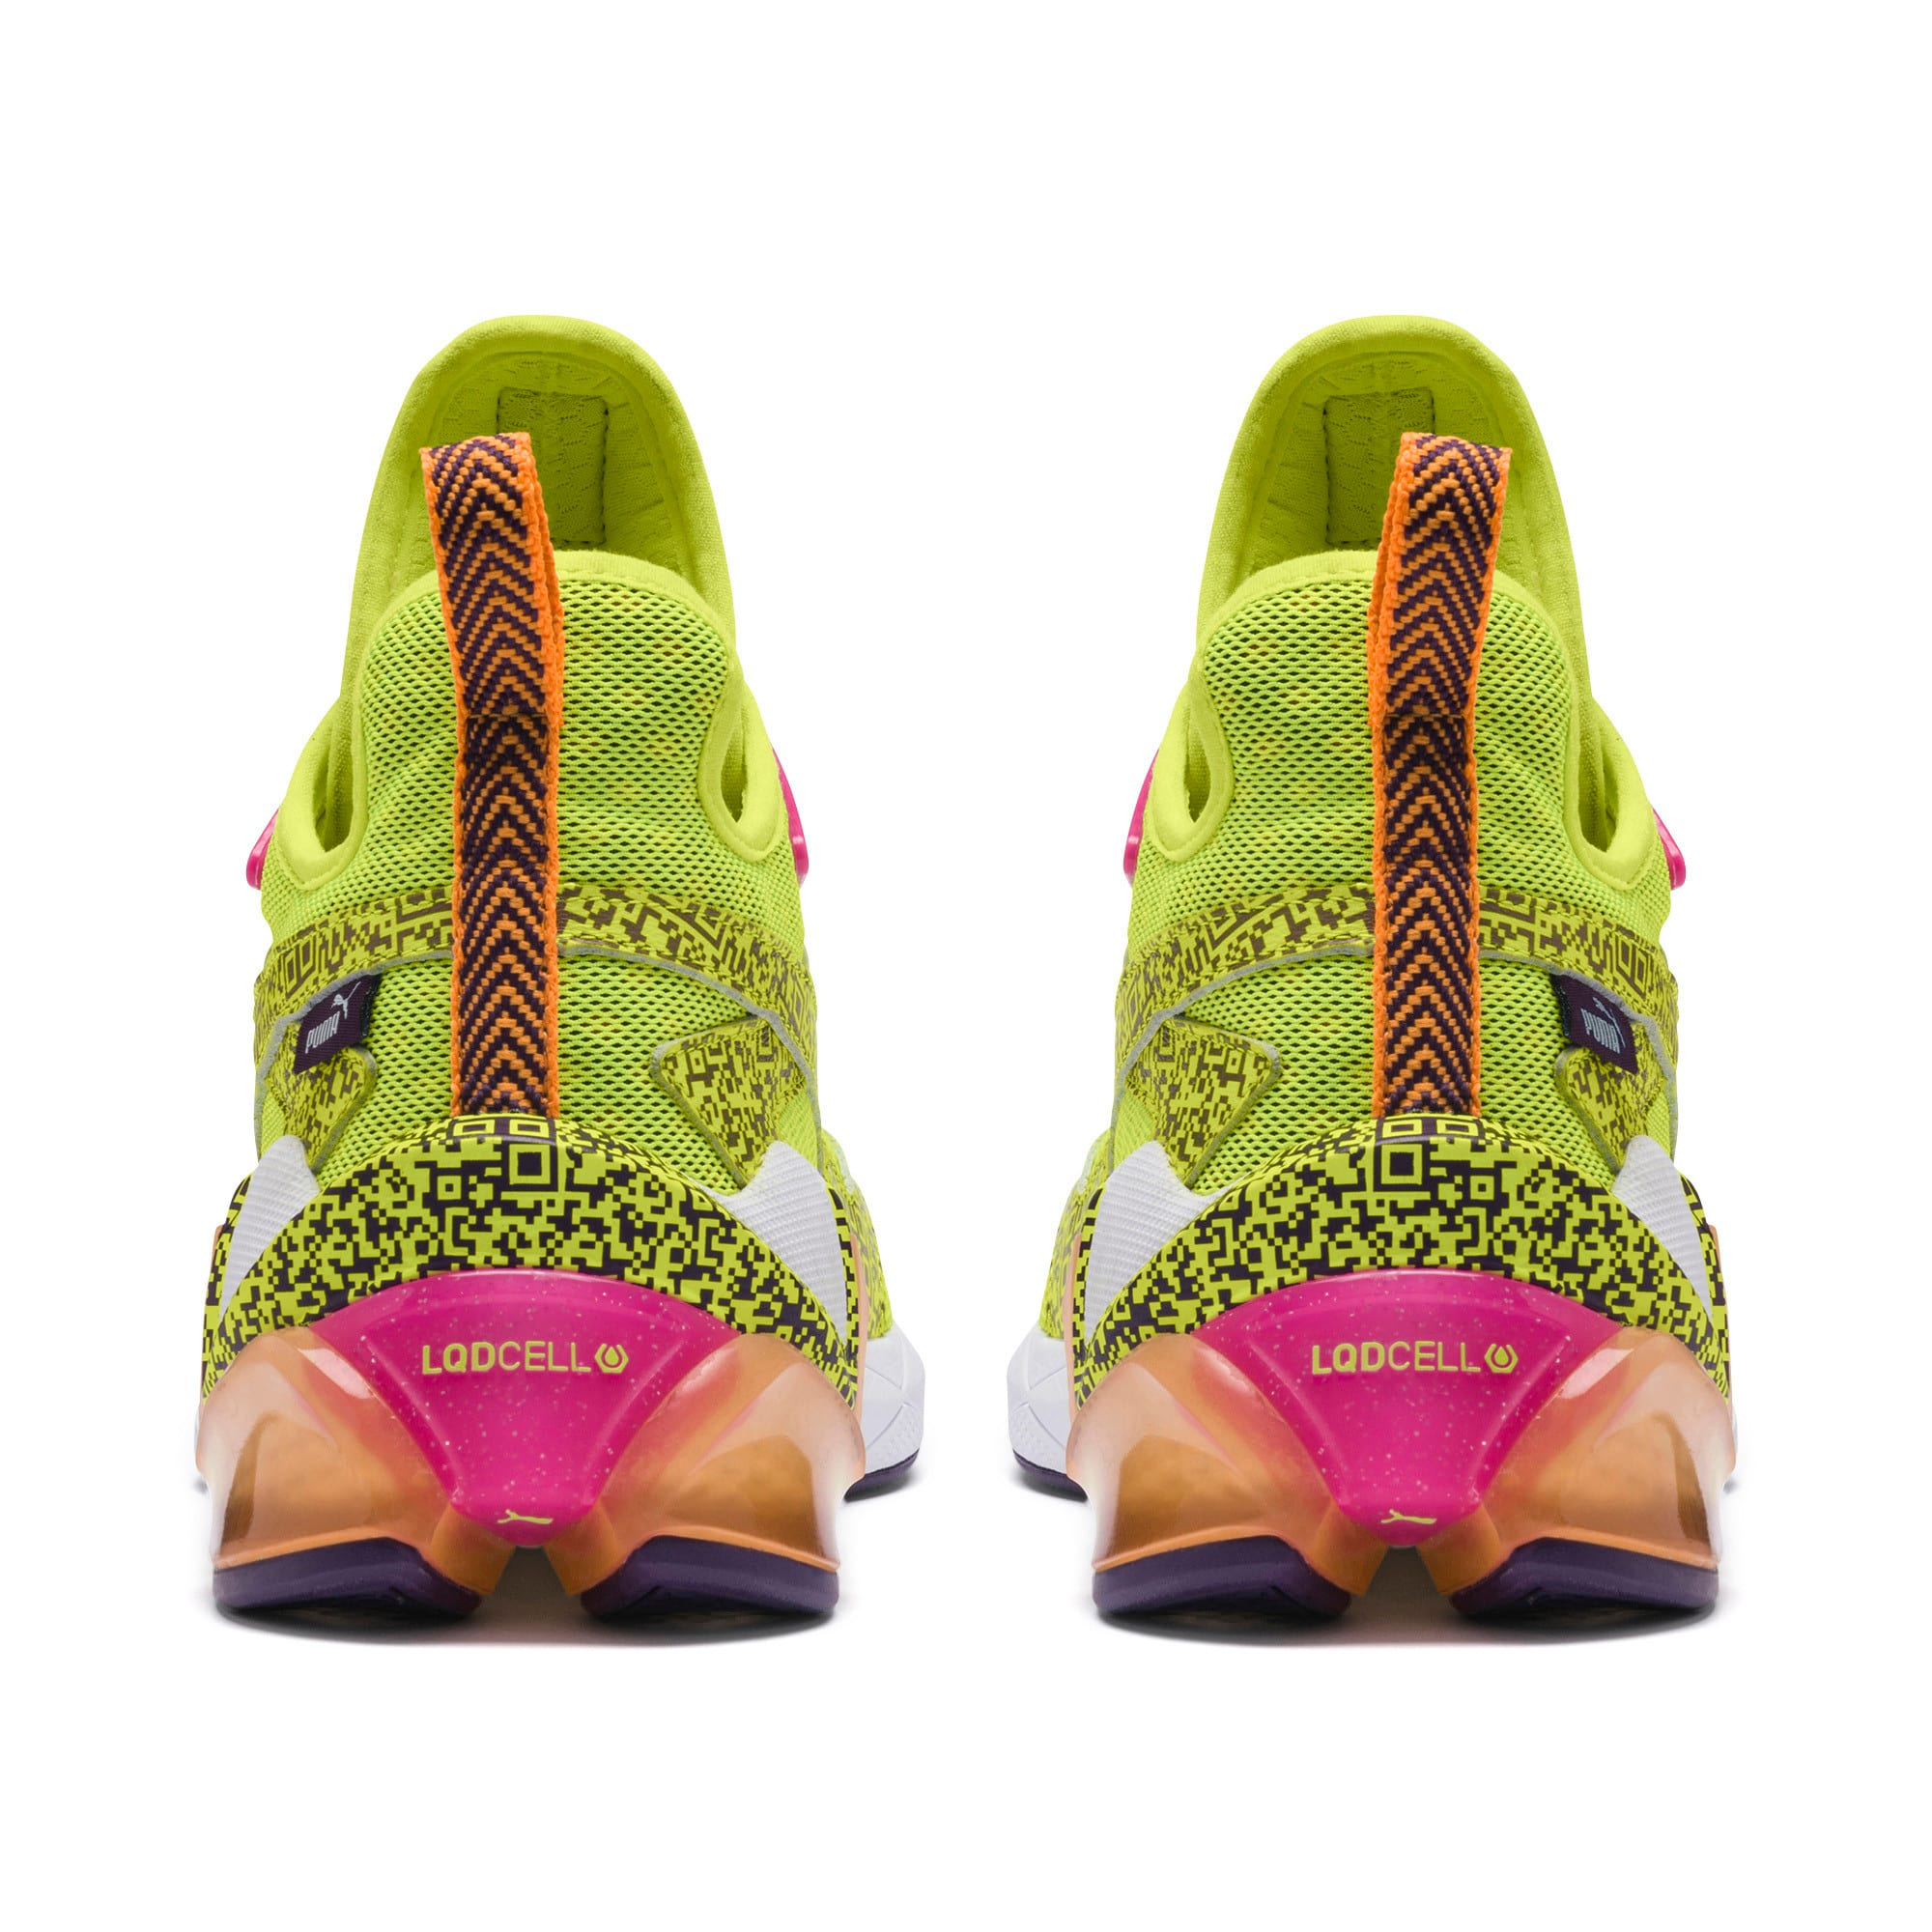 Thumbnail 3 of LQDCELL Origin AR Men's Training Shoes, Fizzy Yllow-Indigo-Ornge Pop, medium